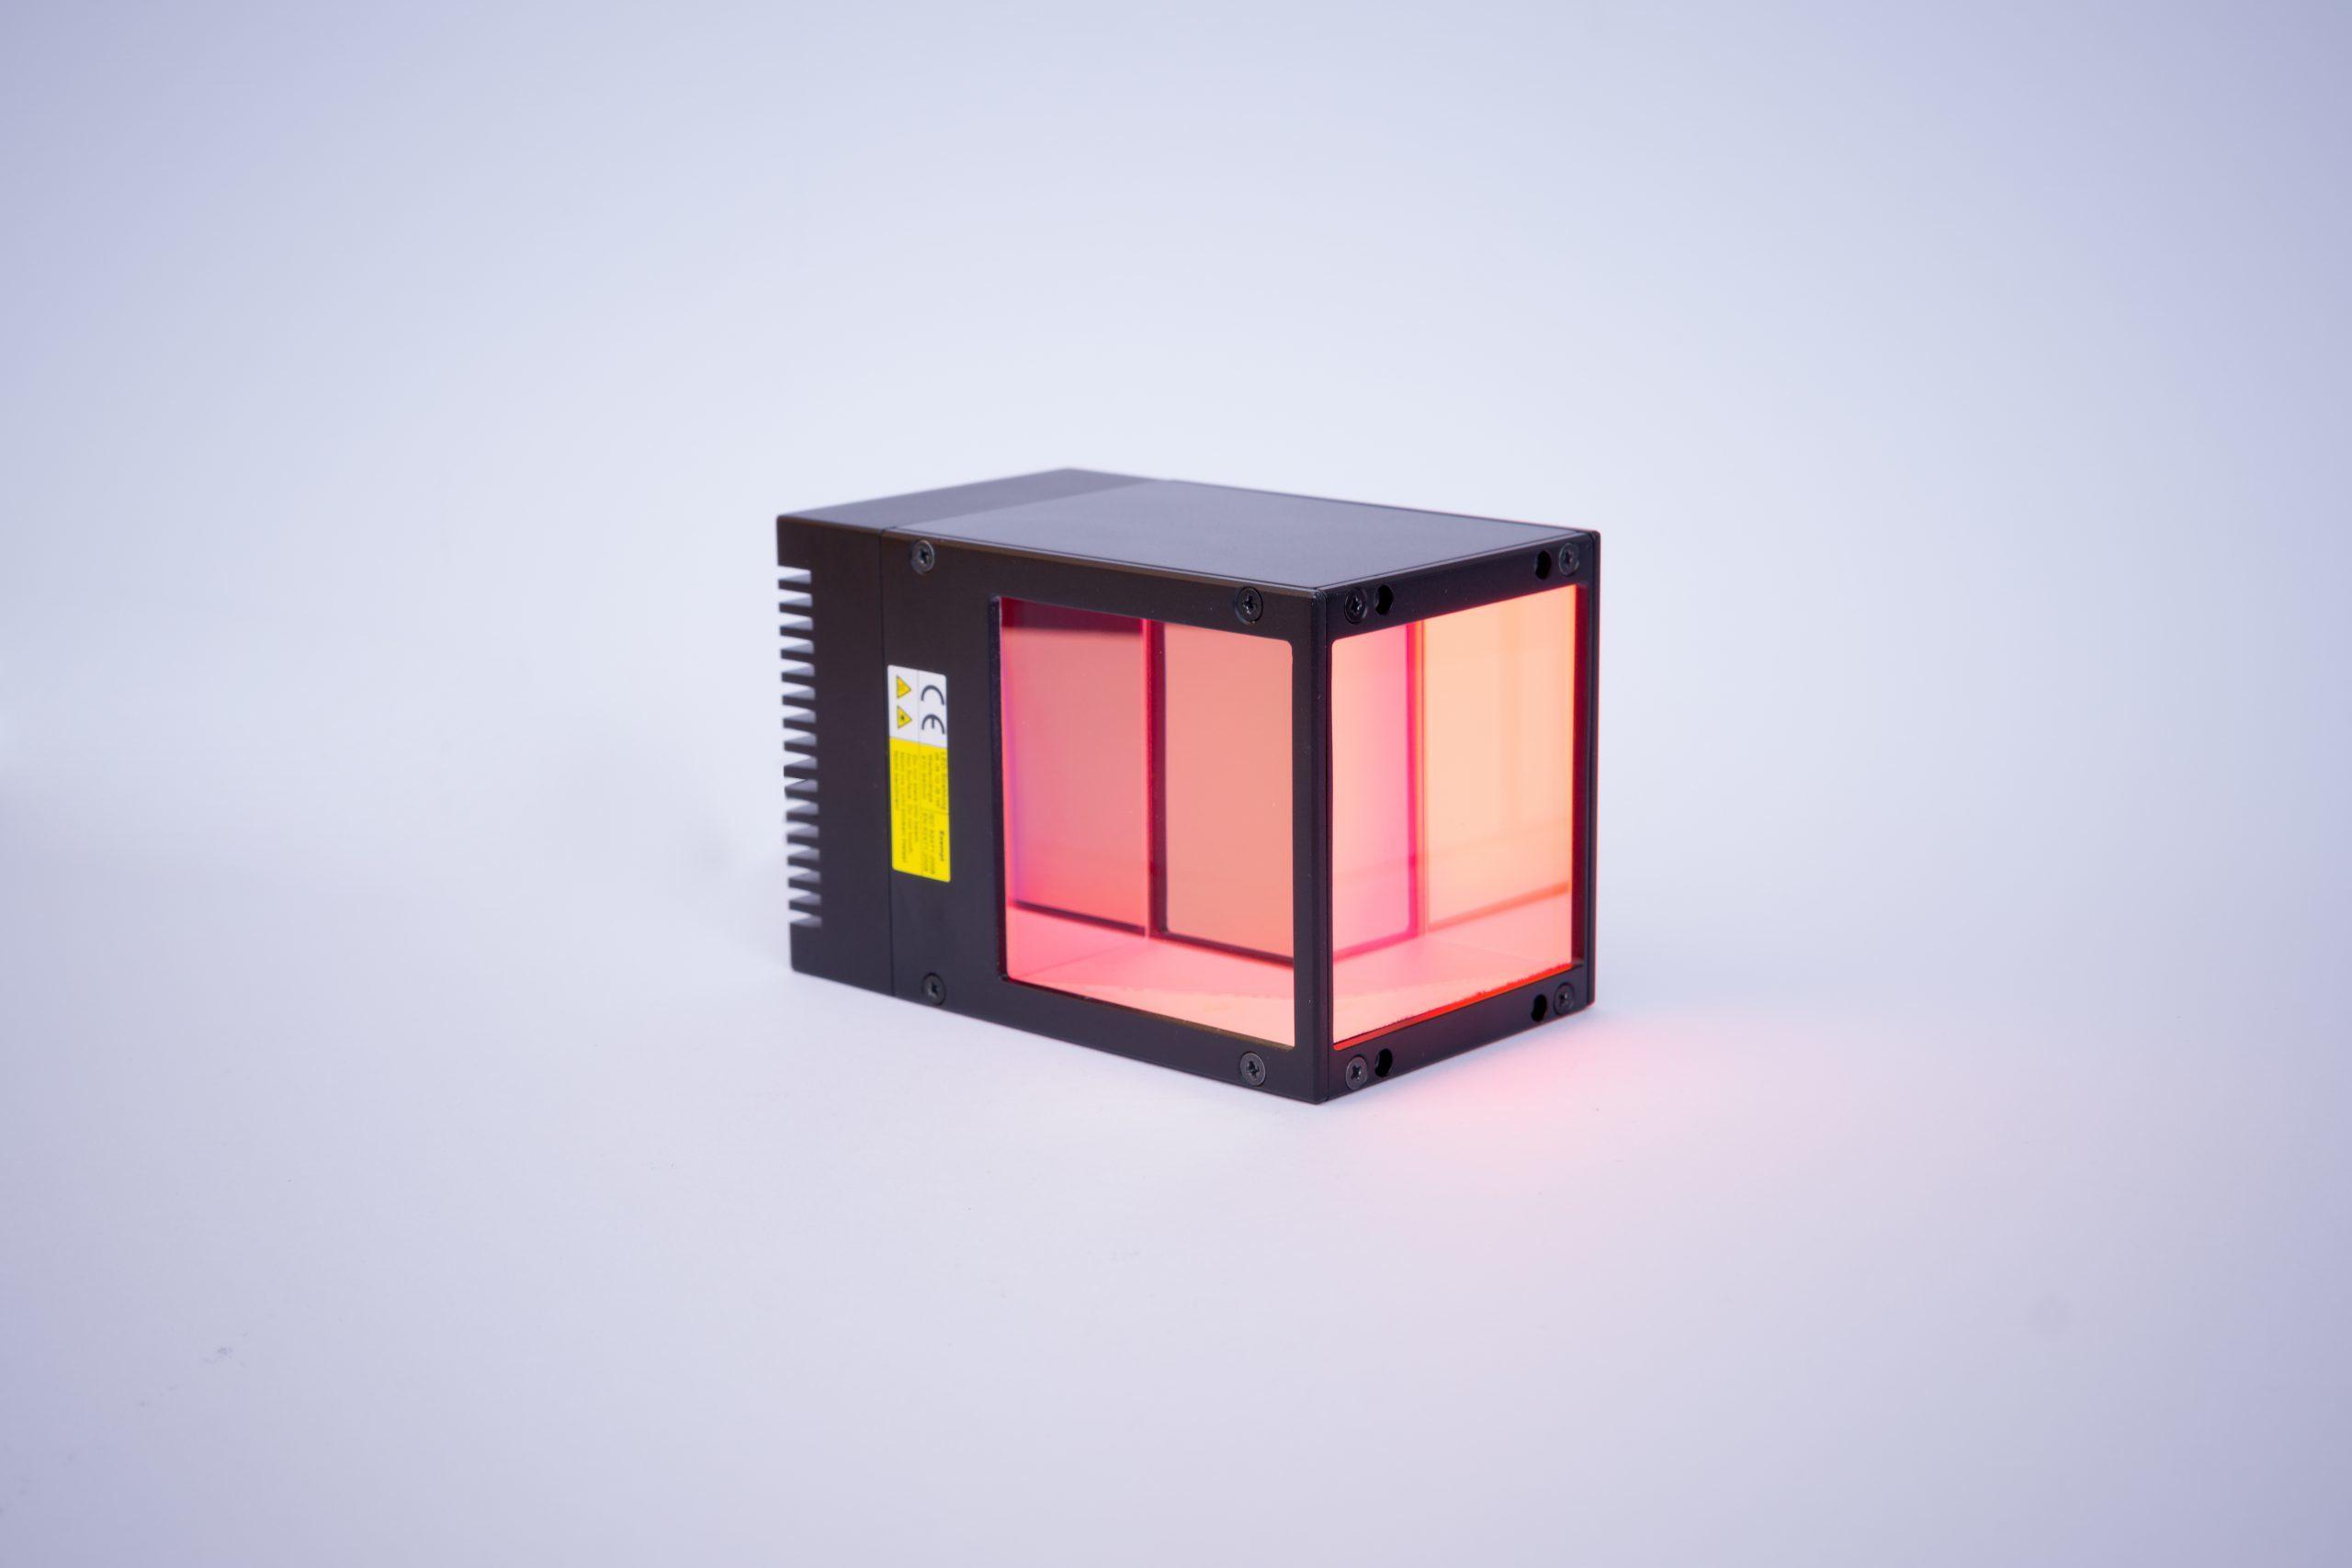 Umgelenkte Koaxialbeleuchtung